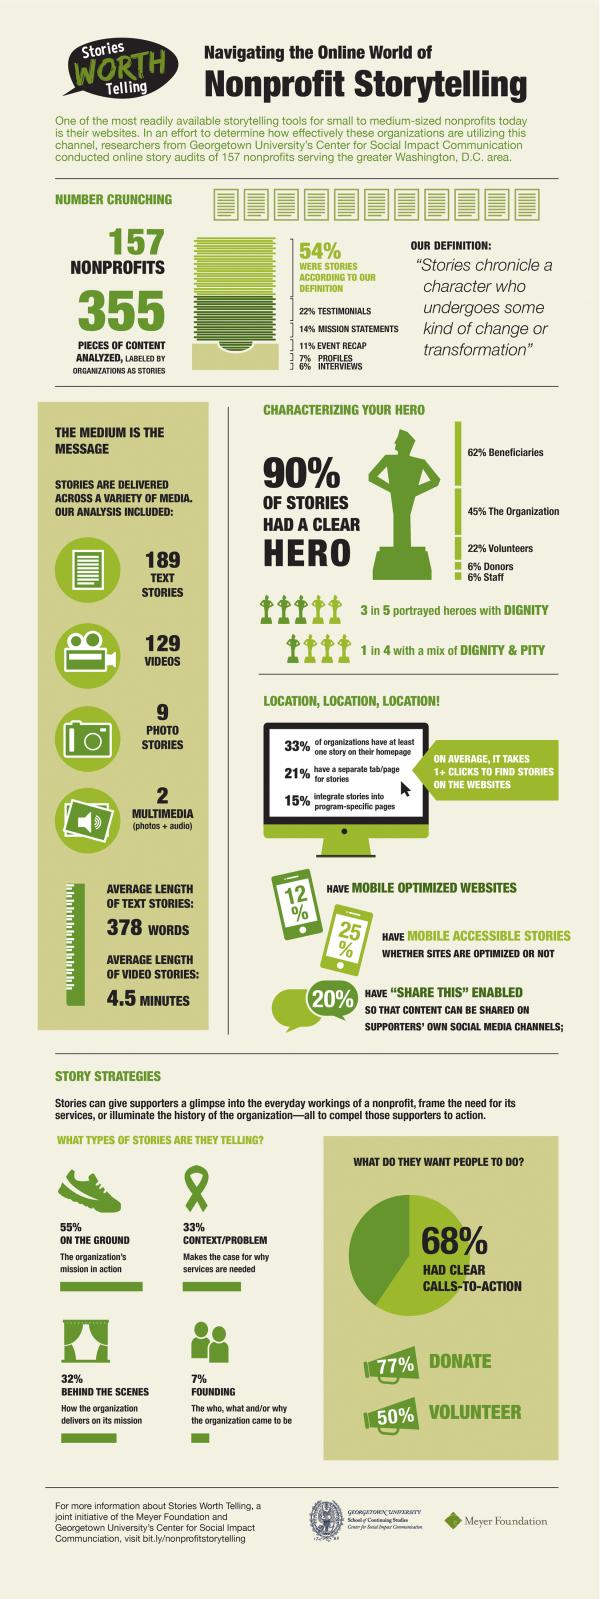 Csic-storiesworthtelling-infographic1